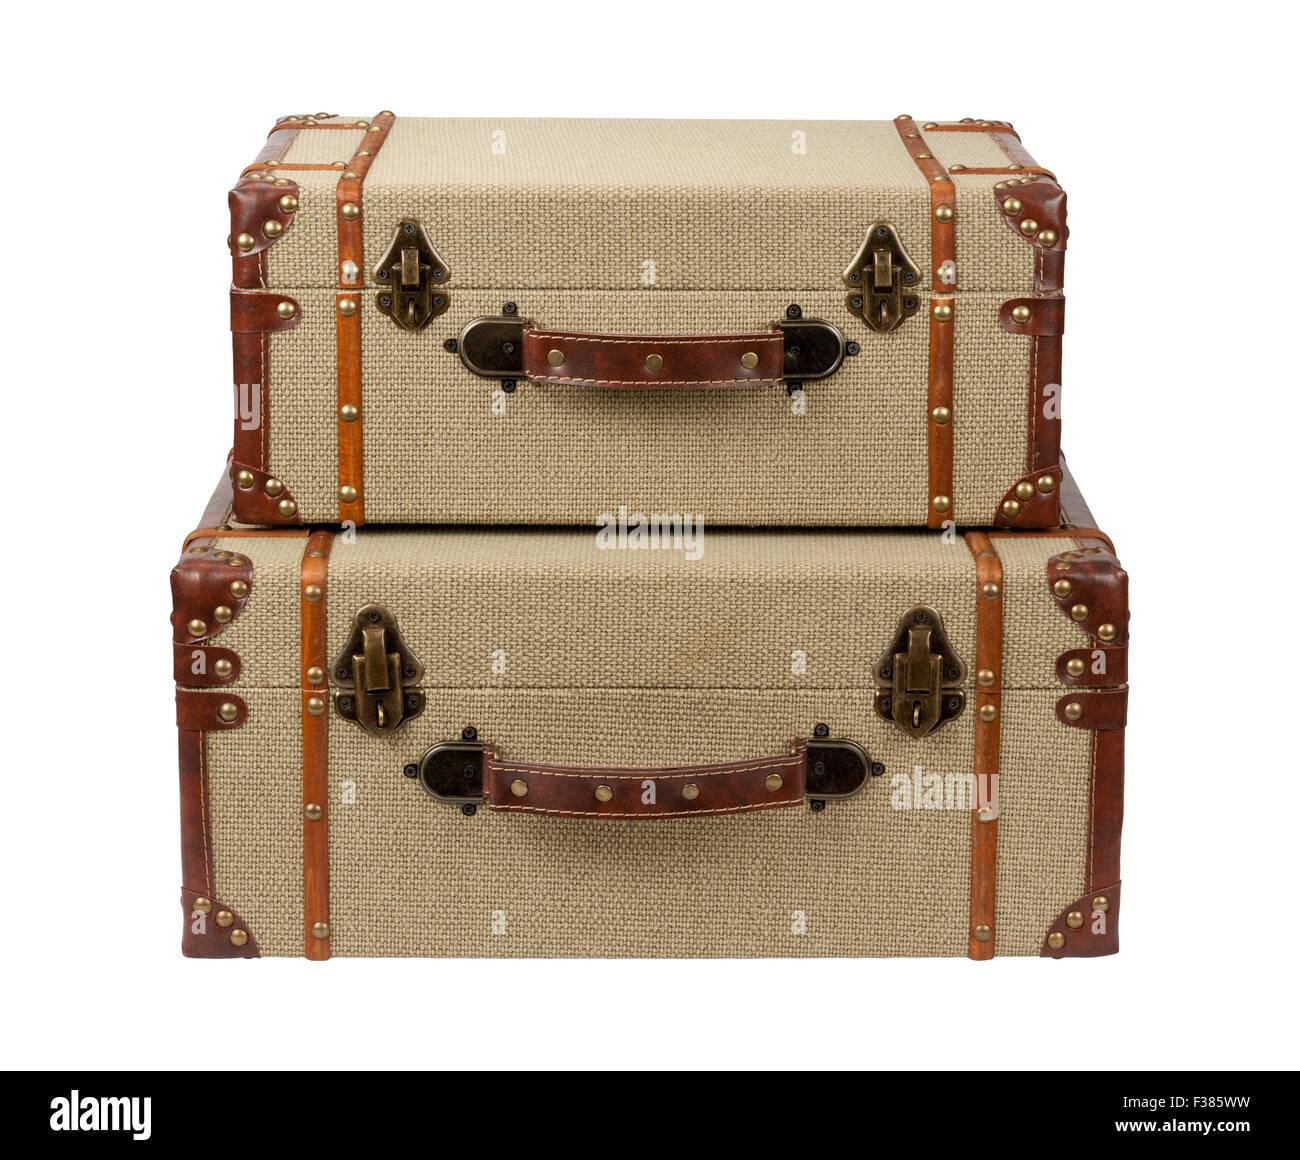 Apilado de madera Deco arpillera maletas Imagen De Stock